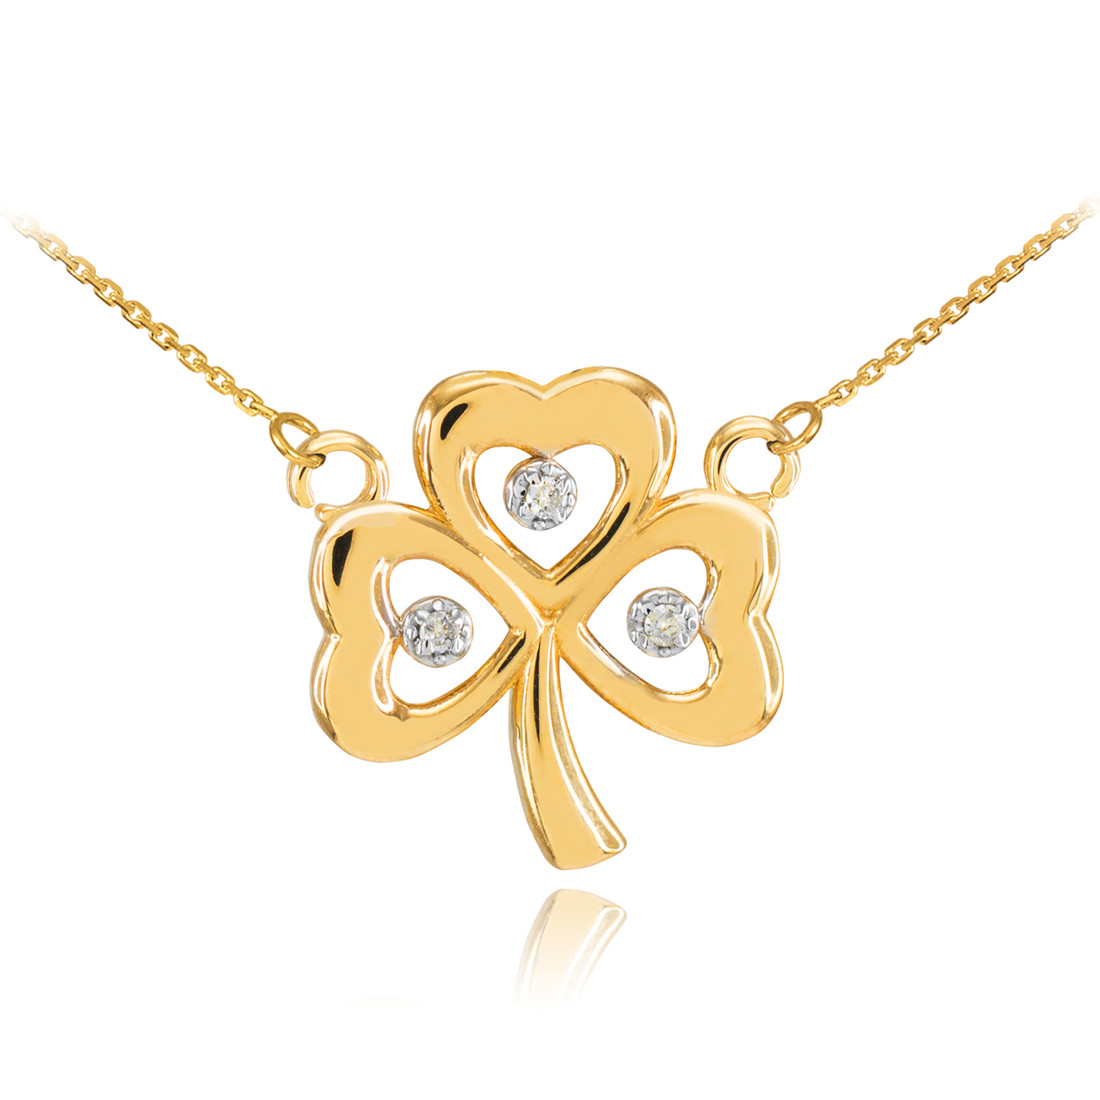 14k Yellow Gold Irish Celtic Shamrock 3 Leaf Clover Pendant Rope Chain Necklace